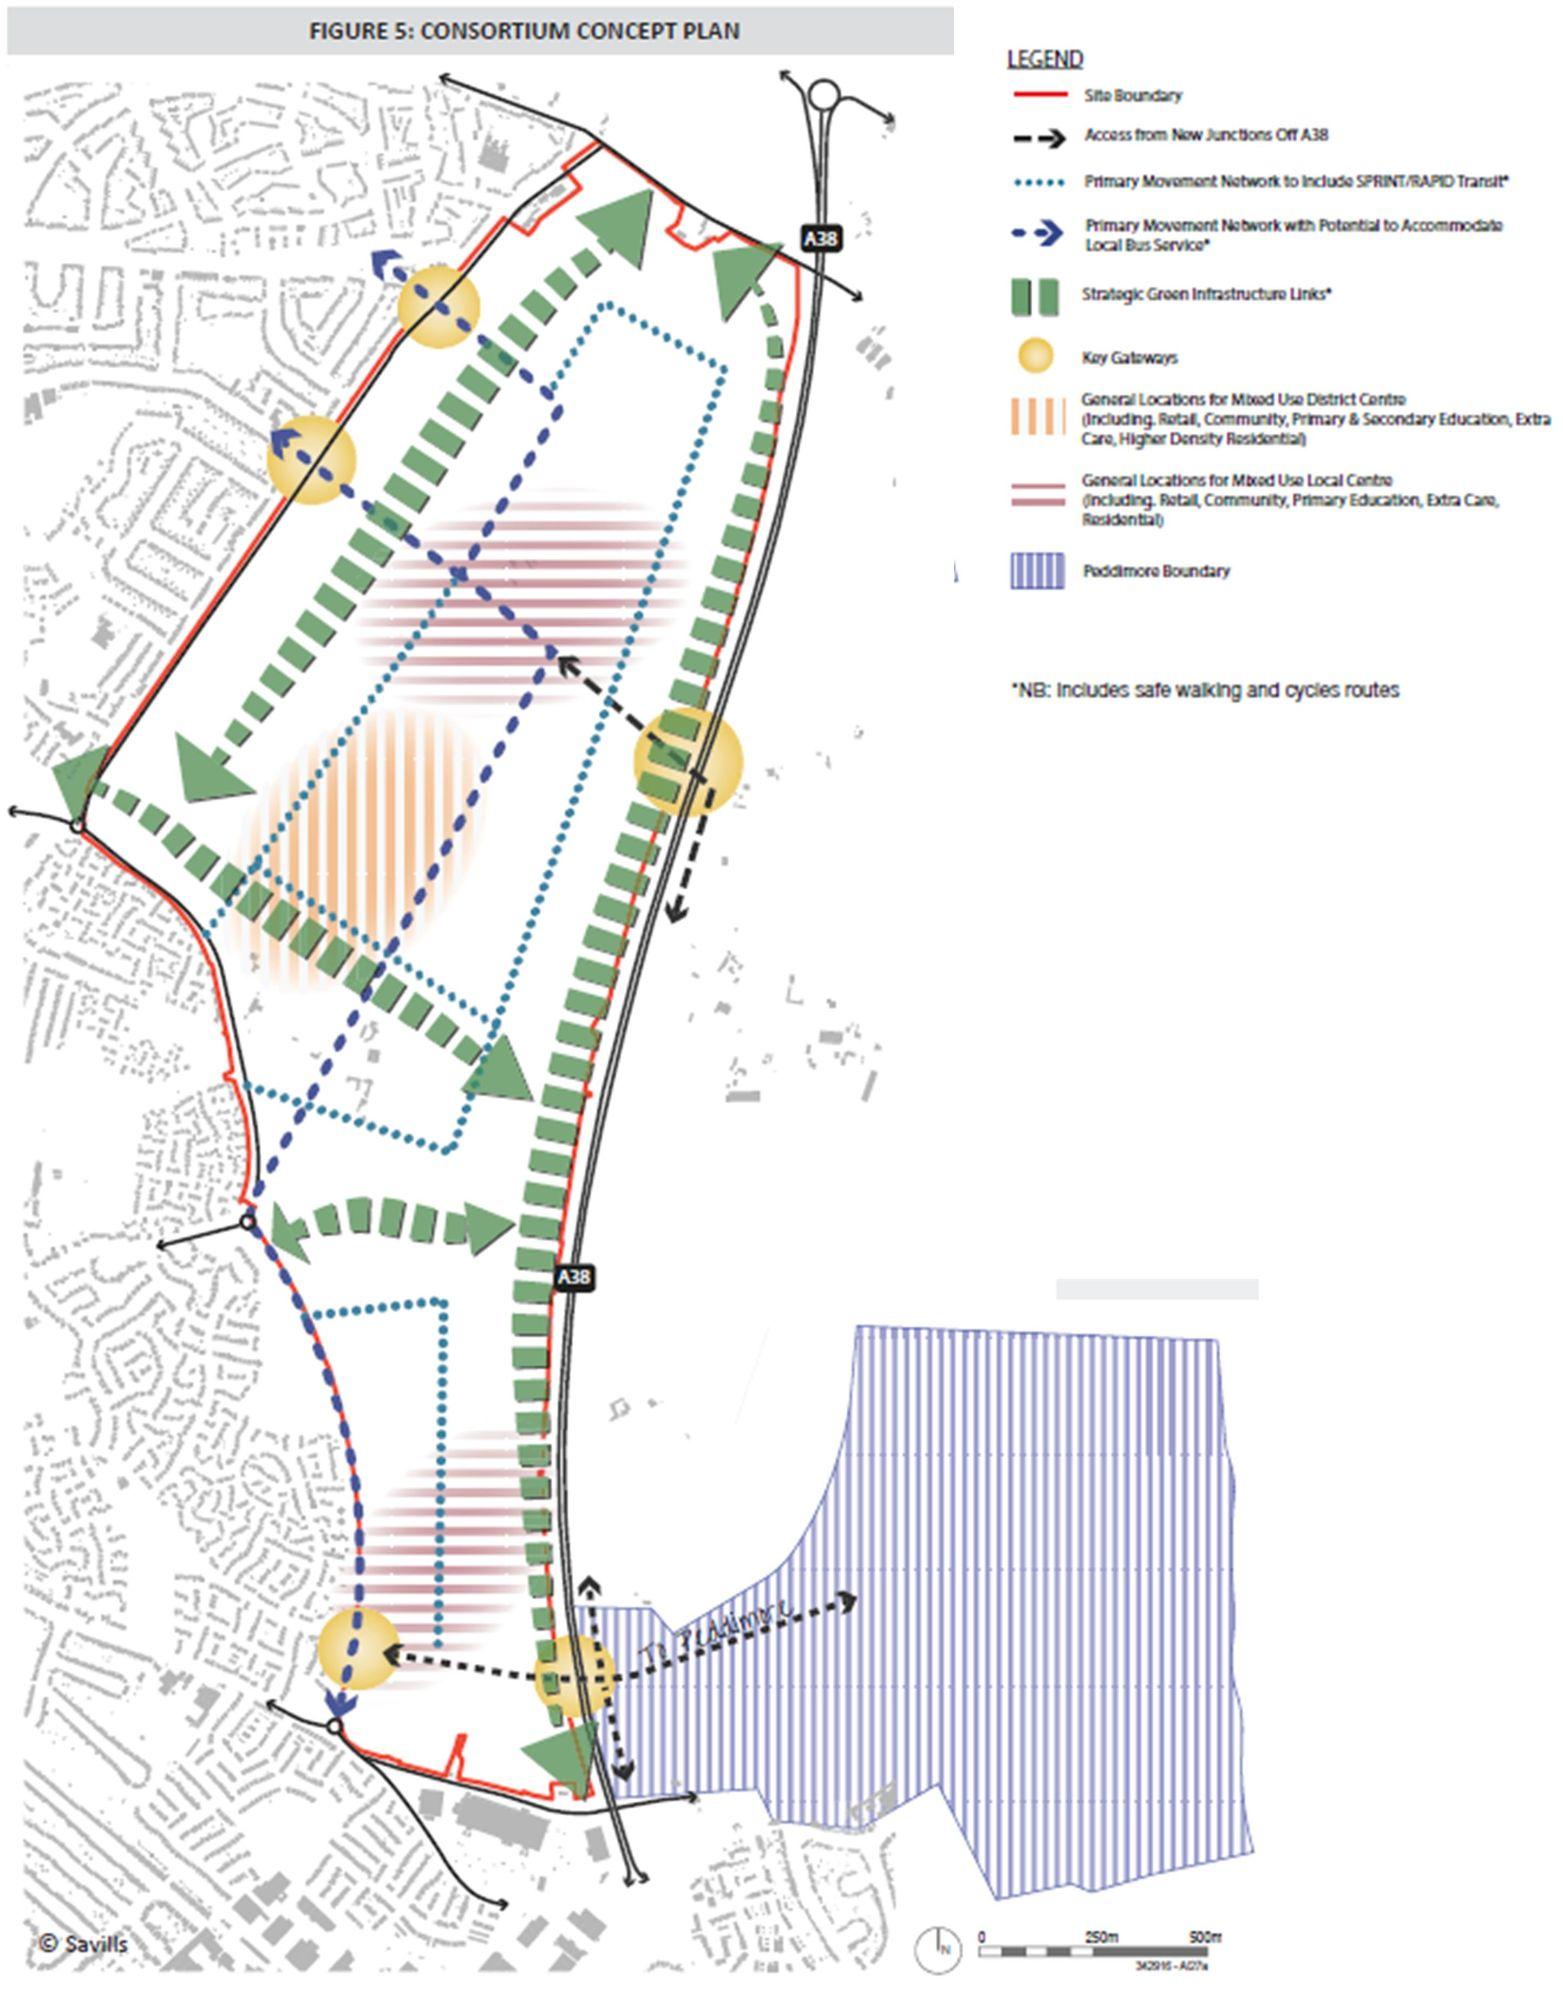 Consortium Concept Plan Langley Sutton Coldfield